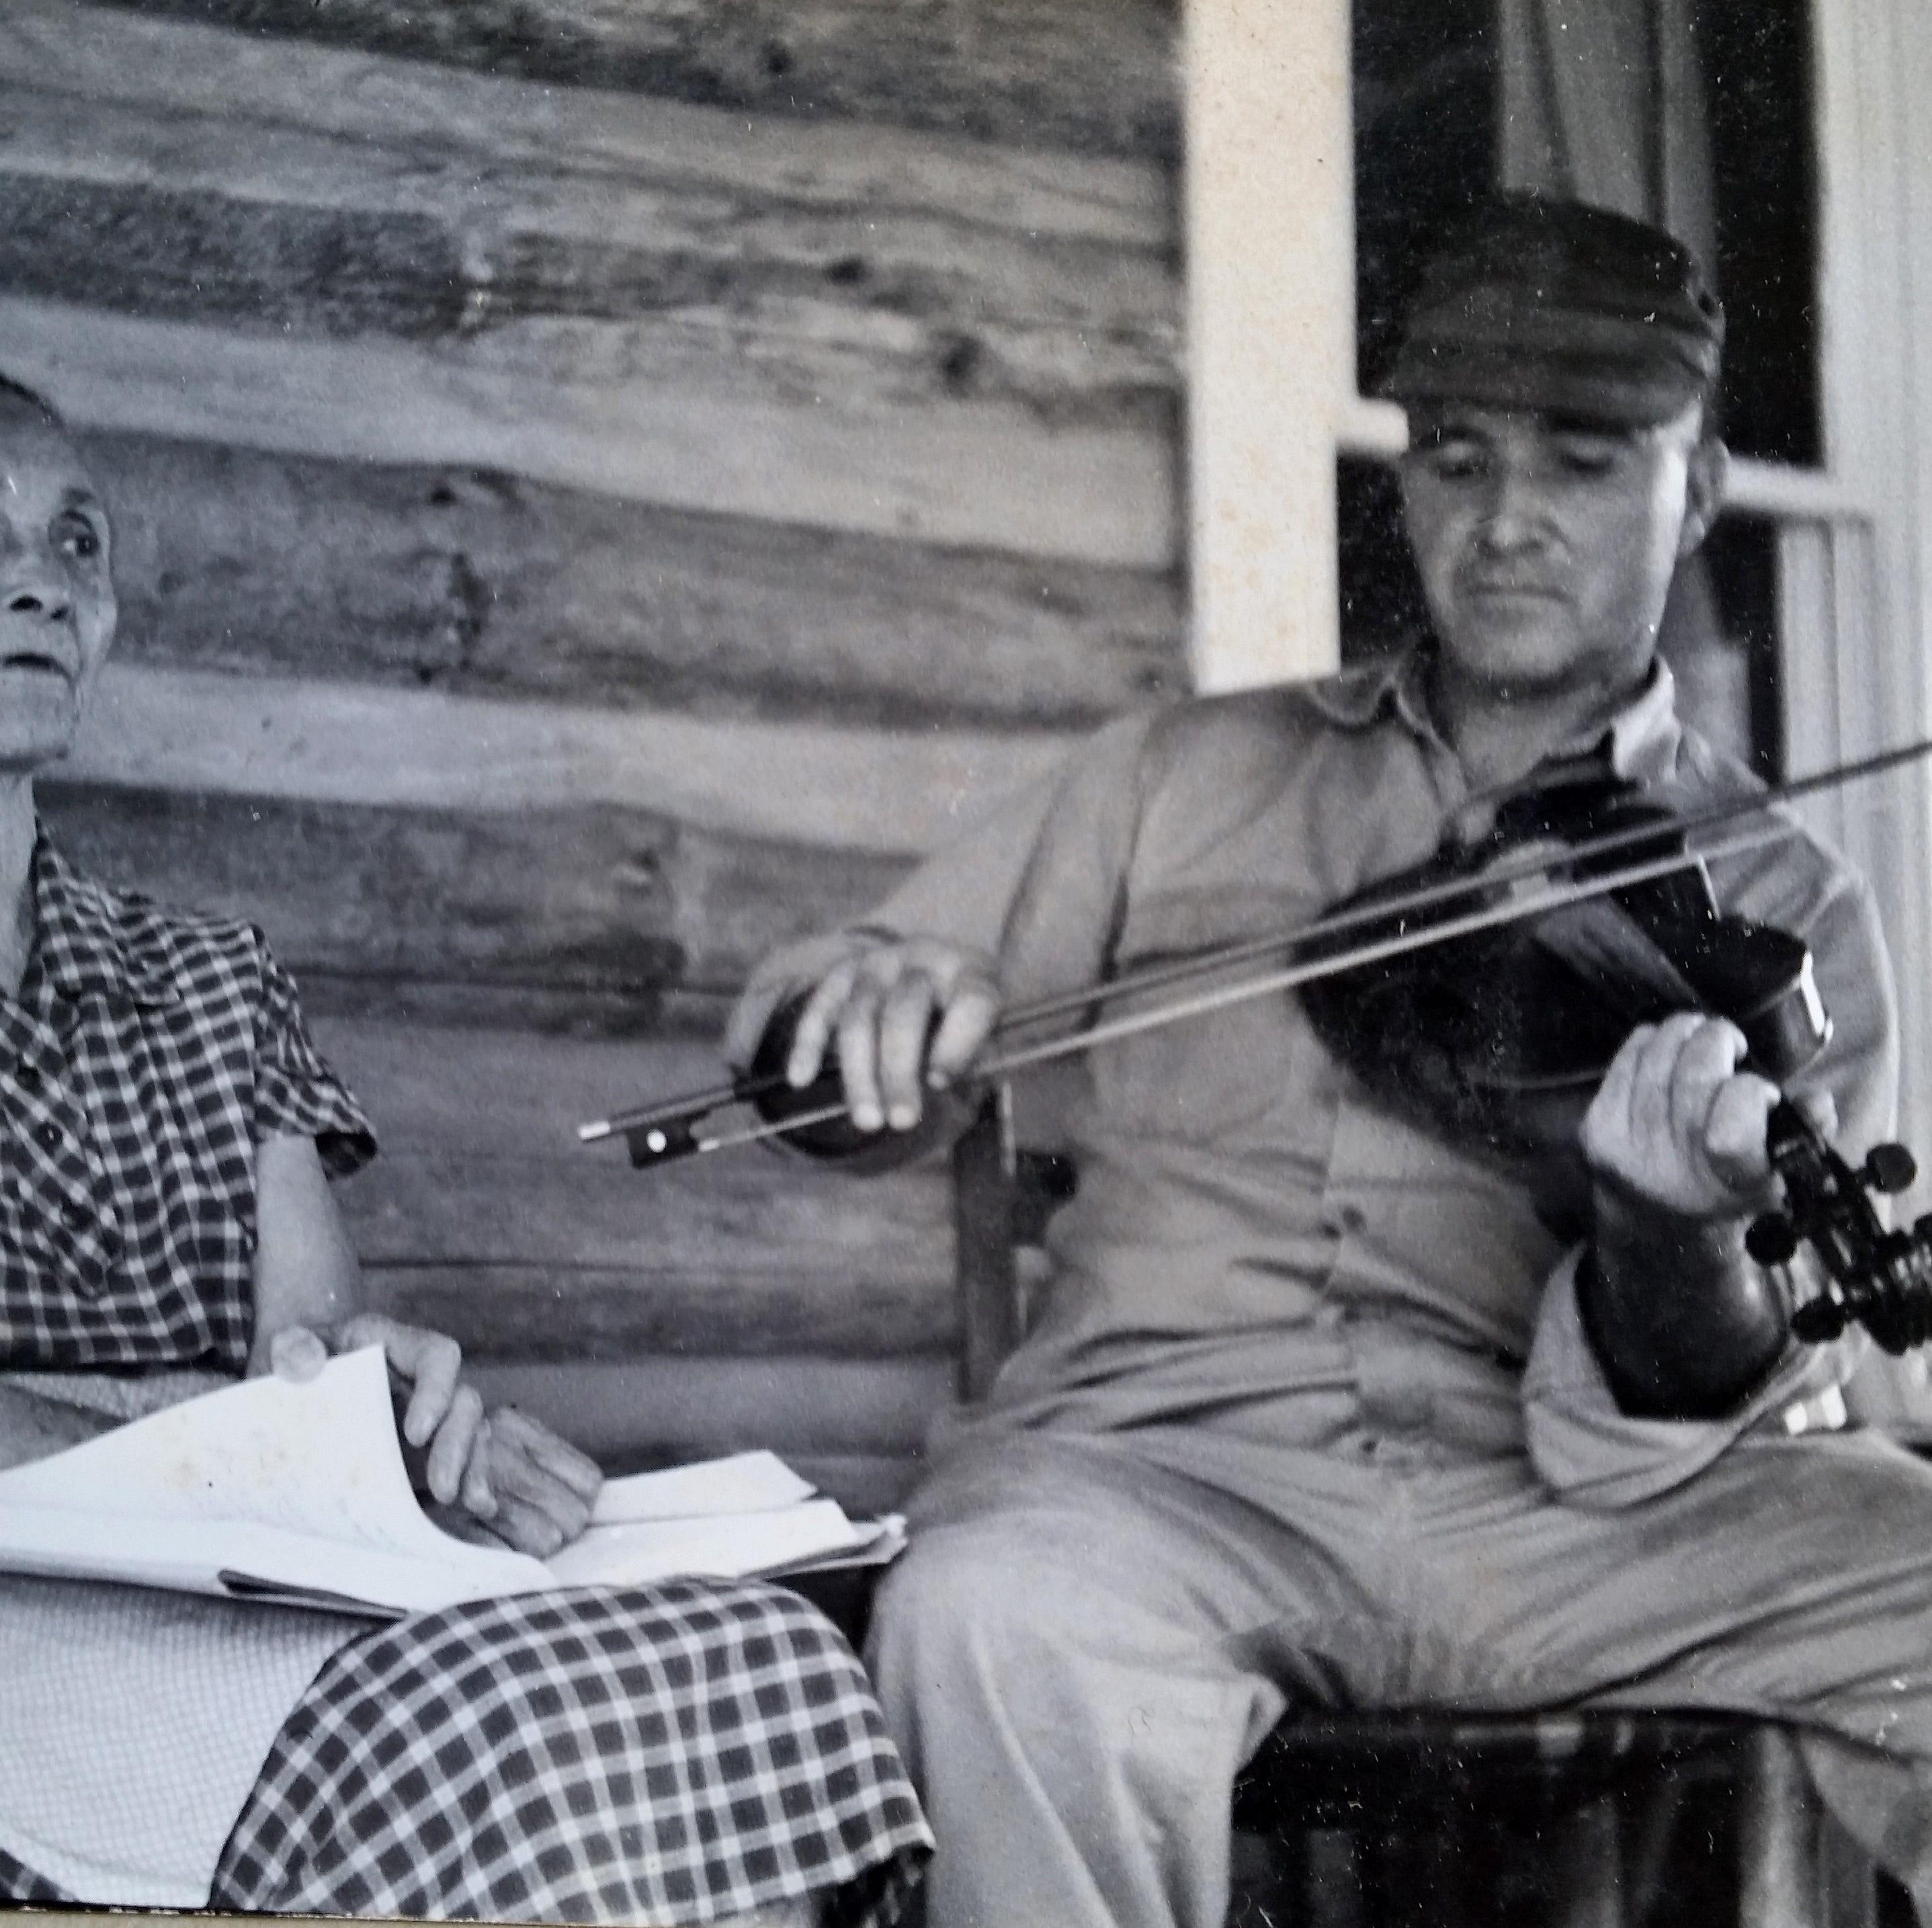 Portrait of the Past: Doug and Berzilla Wallin, 1962